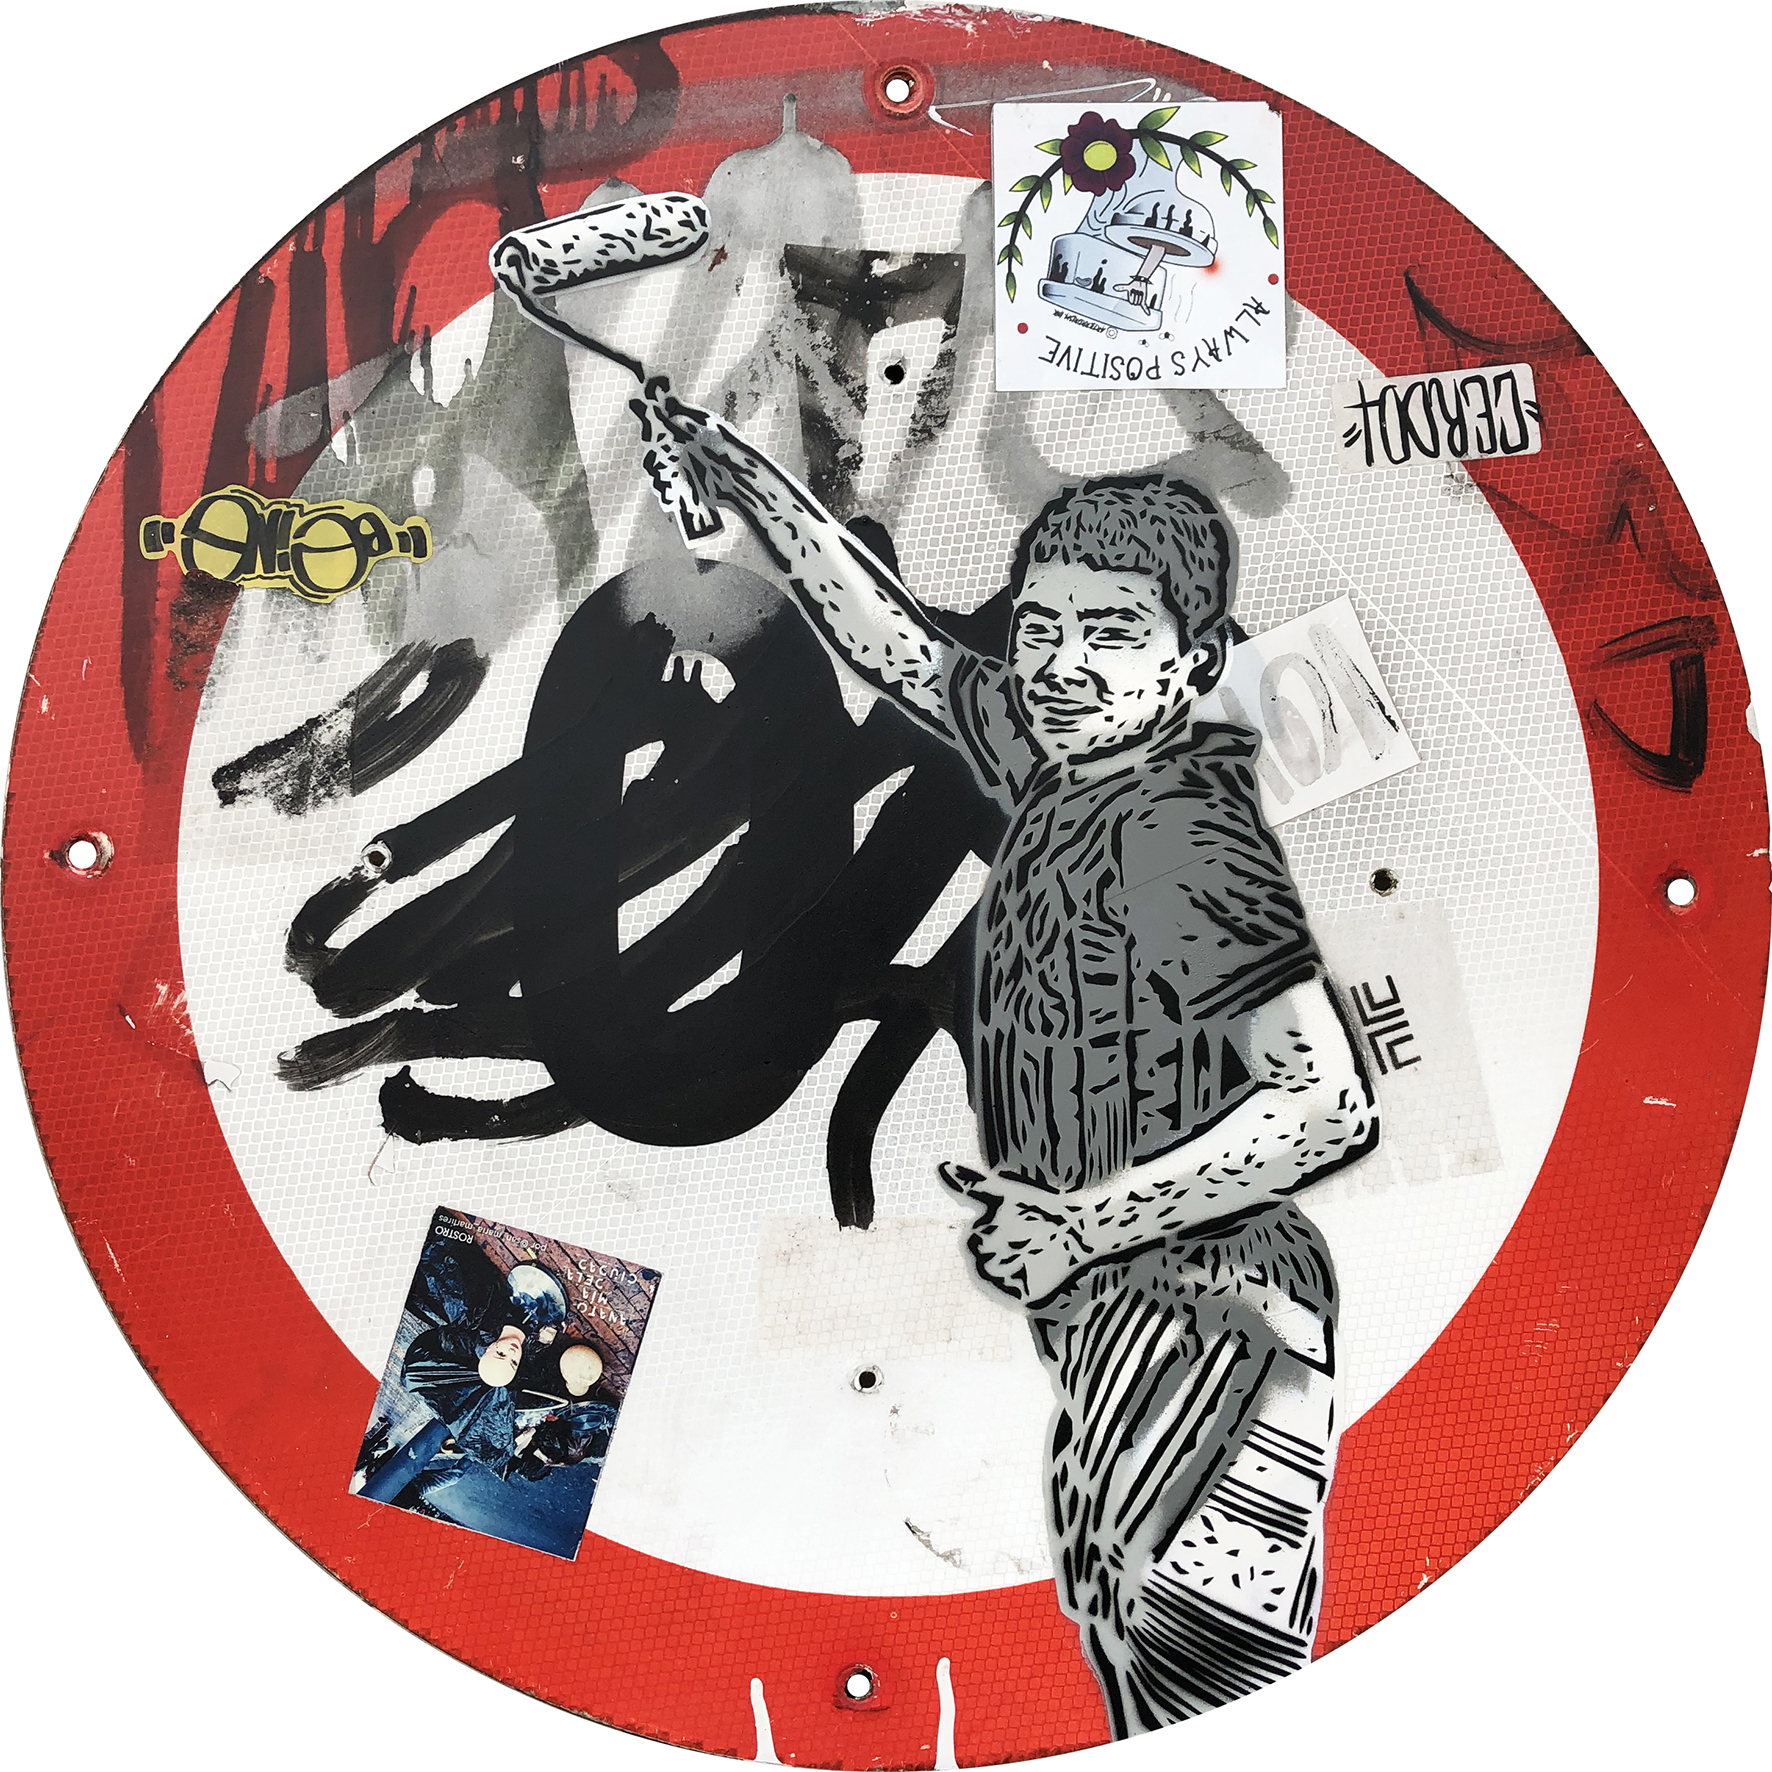 Niño pinta. de la serie Orgullo de calle (2018) - 60 cm diámetro - Stencil sobre señal de tráfico / Stencil on Traffic sign